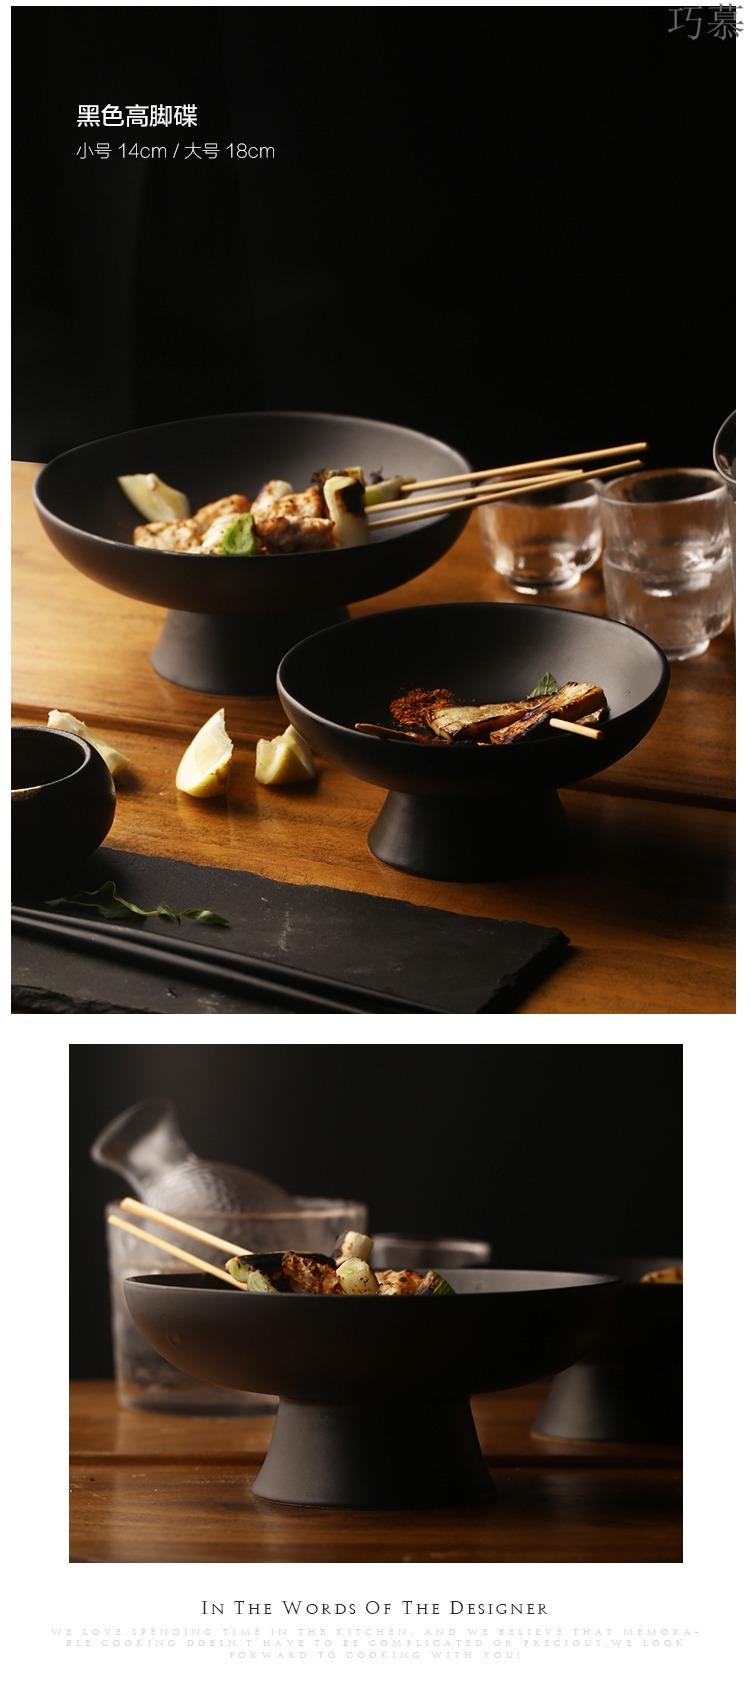 Qiao mu DY creative Japanese ceramics high dish home snack dish restaurant dish pastry dishes dessert dish bowl